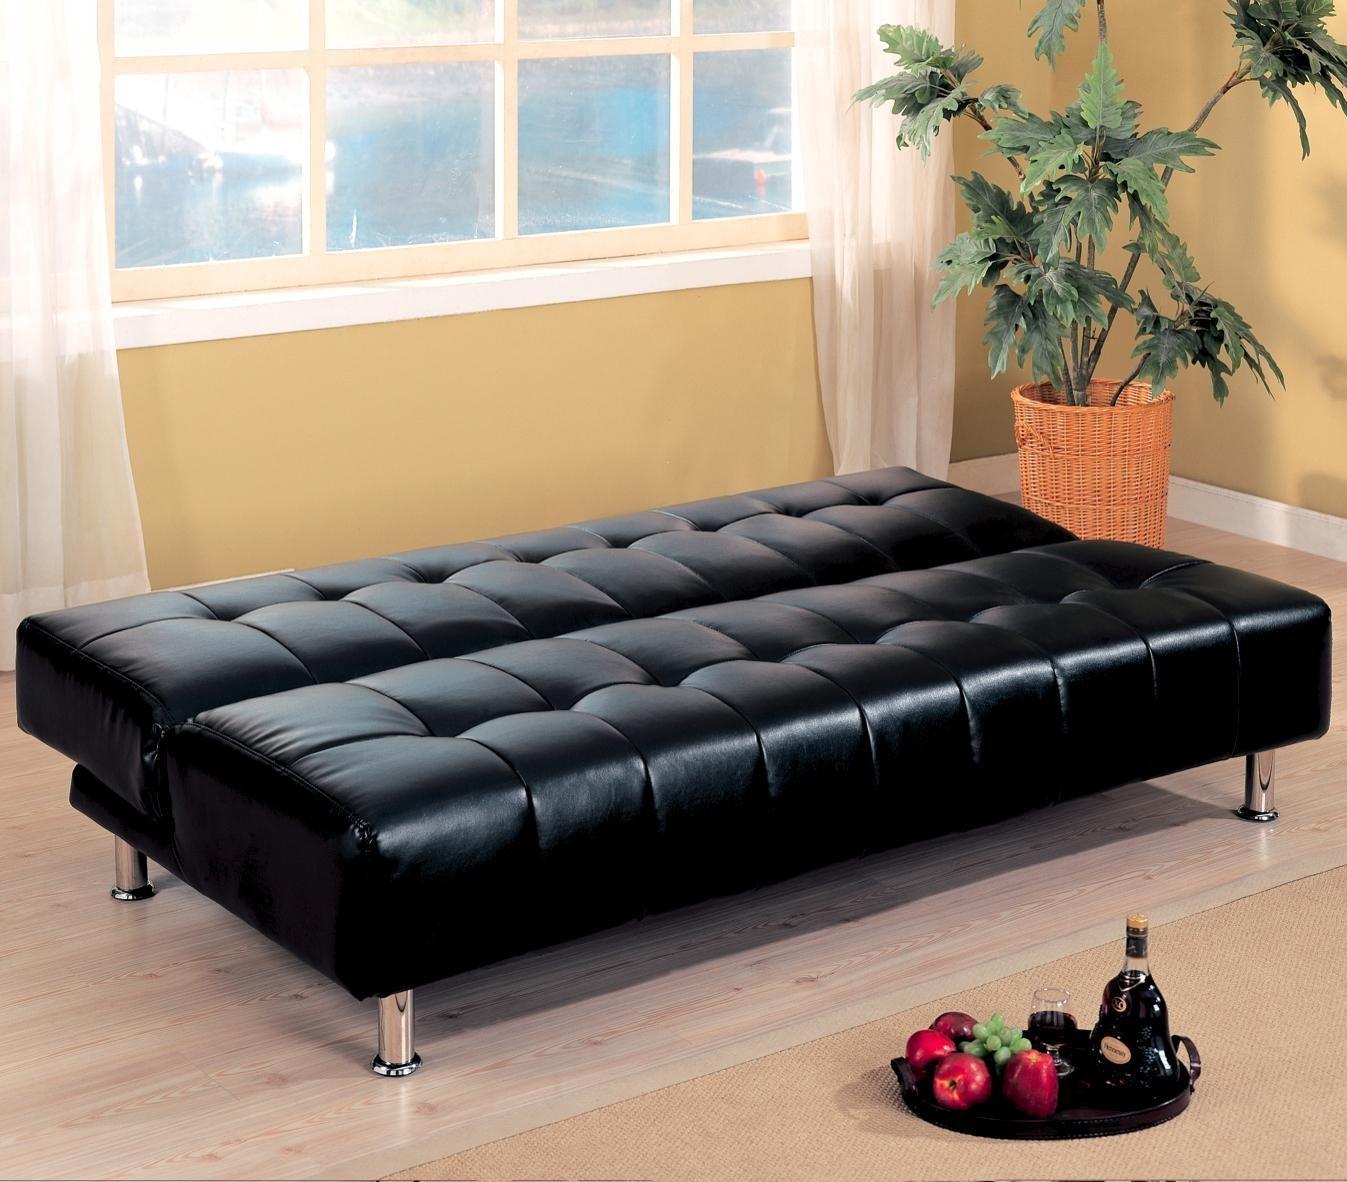 Living Room Sets And Sofa Convertible – Convertible Sofa Bed: The With Sofa Convertibles (View 2 of 20)